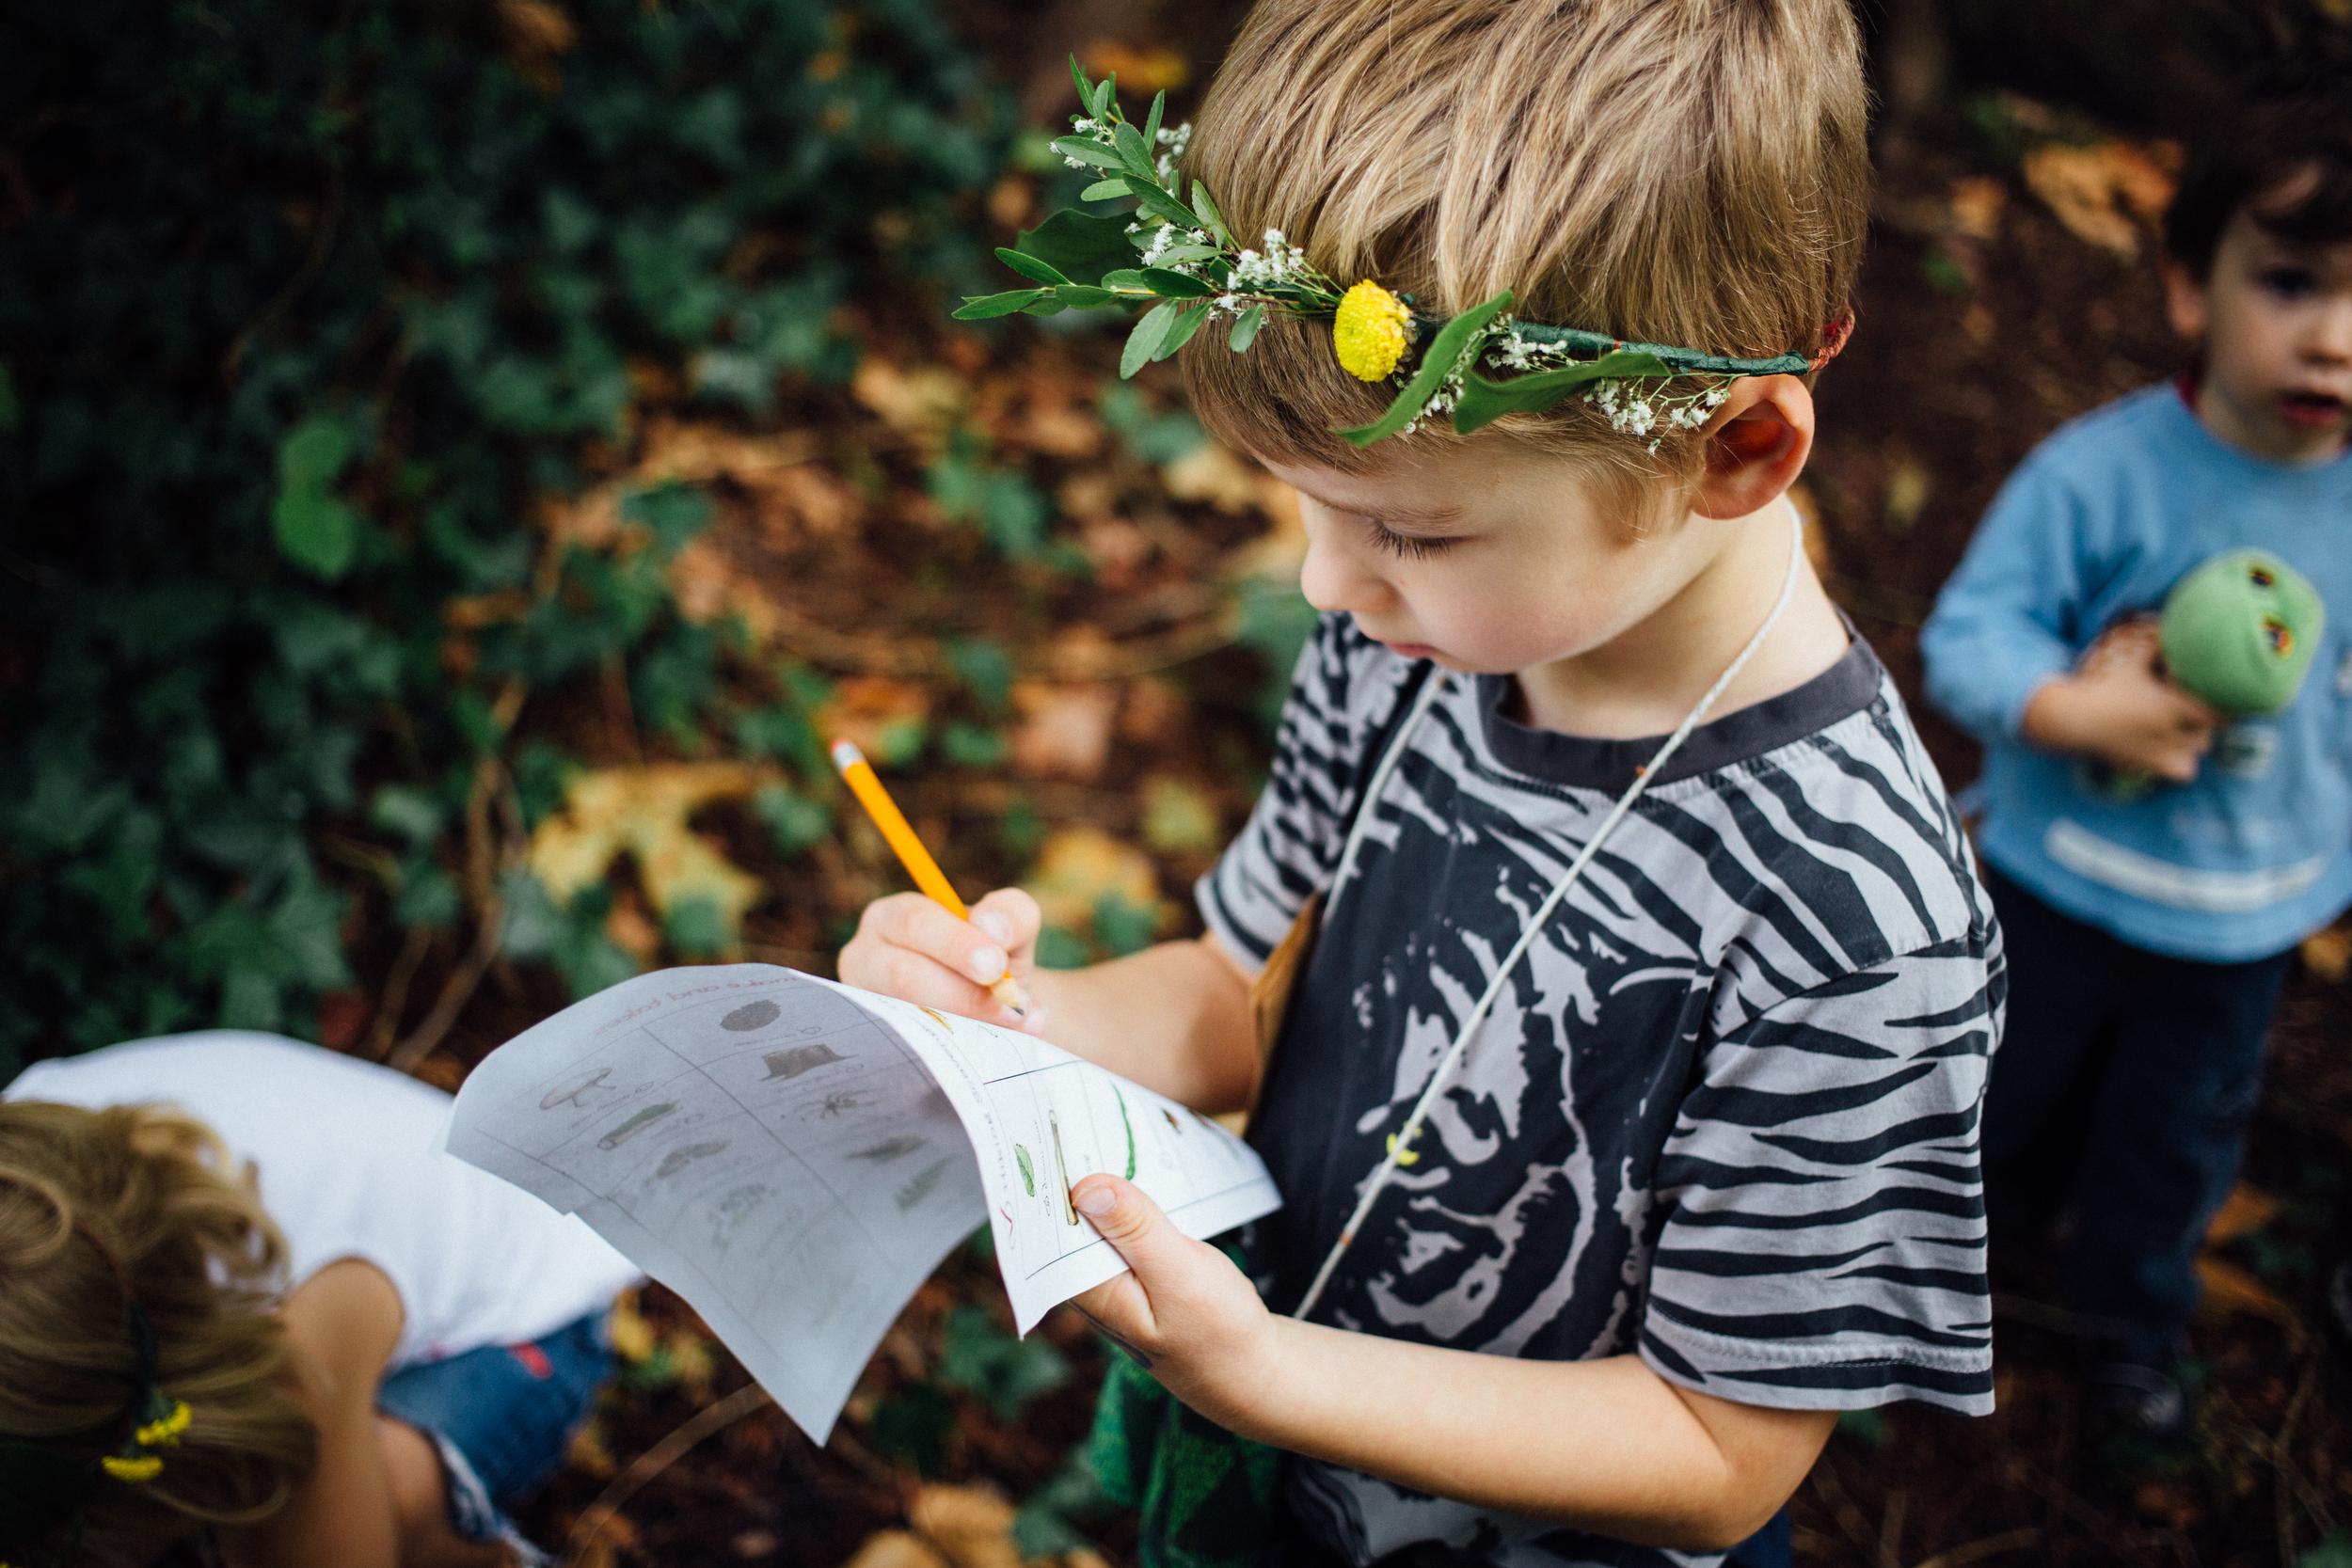 dogwoodphotography_photographer_vancouver_child_roosbday-5.jpg